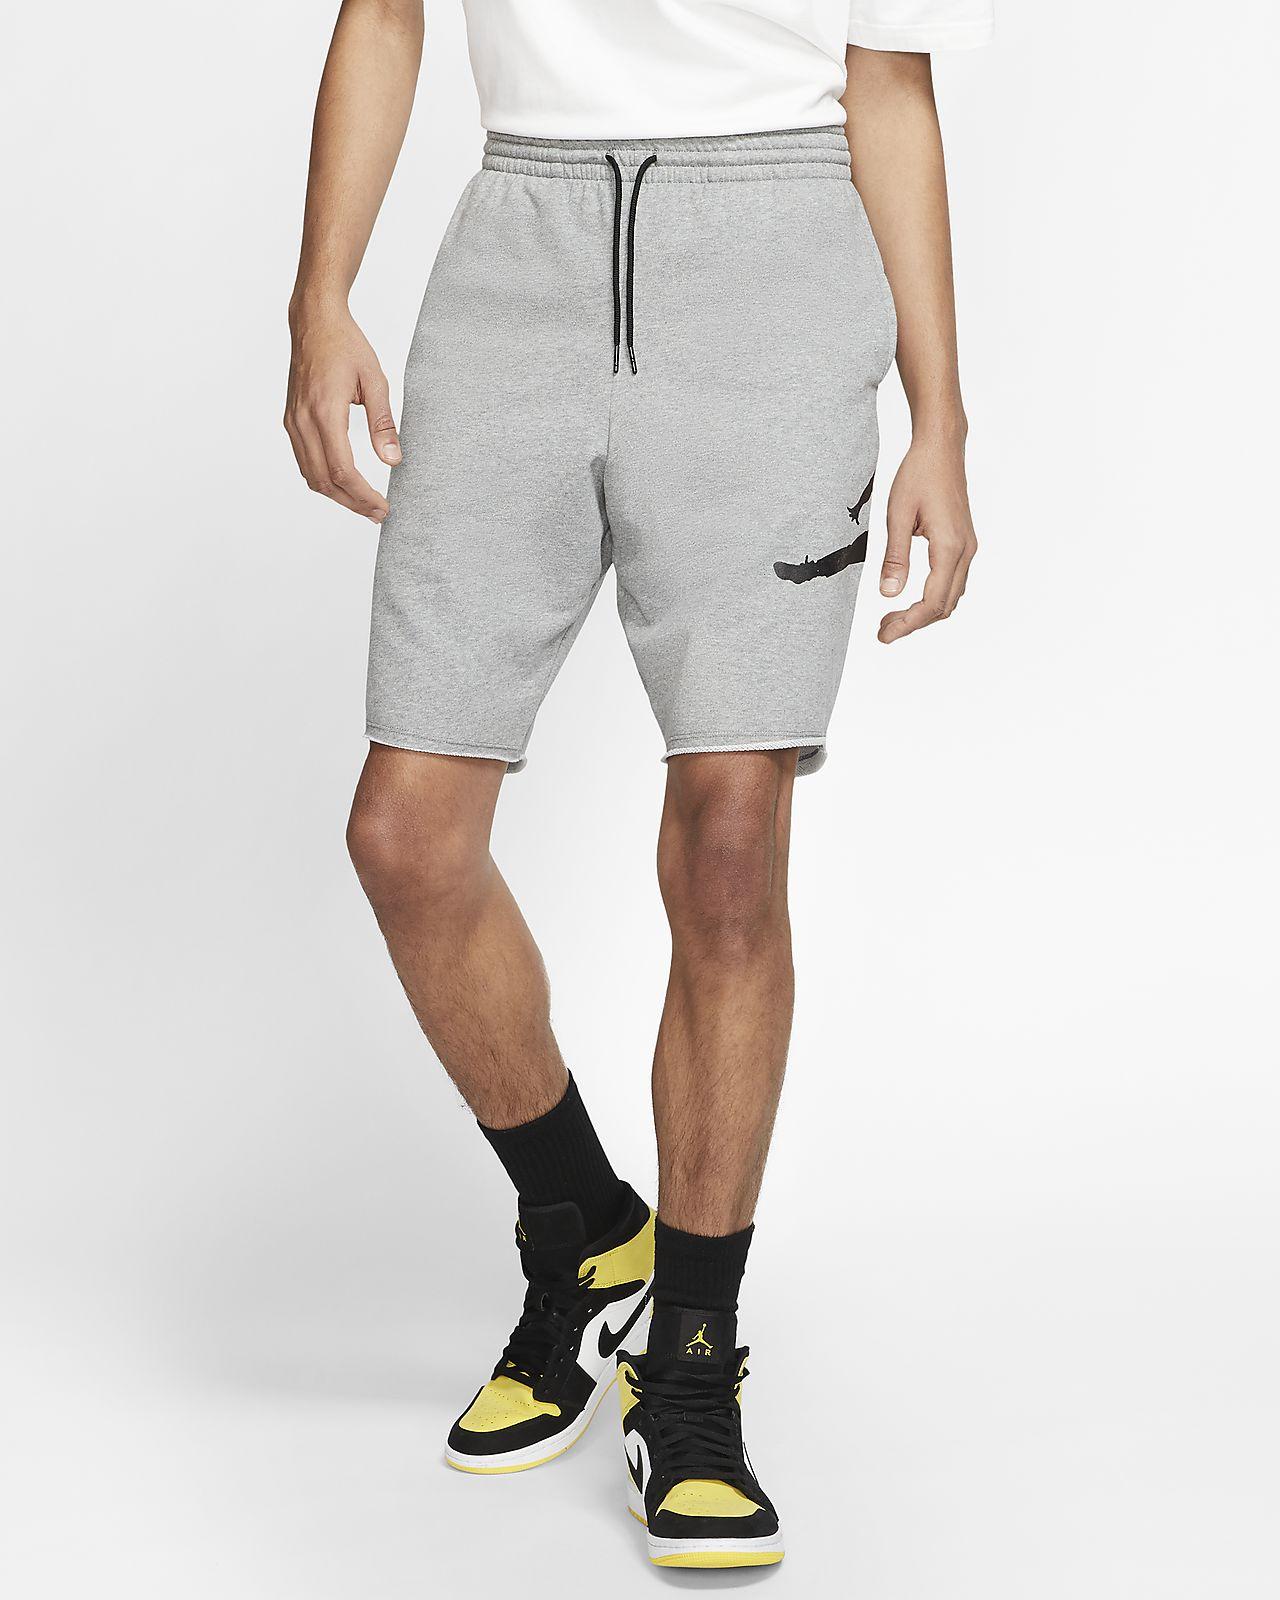 air jordan sweat shorts closeout 24a93